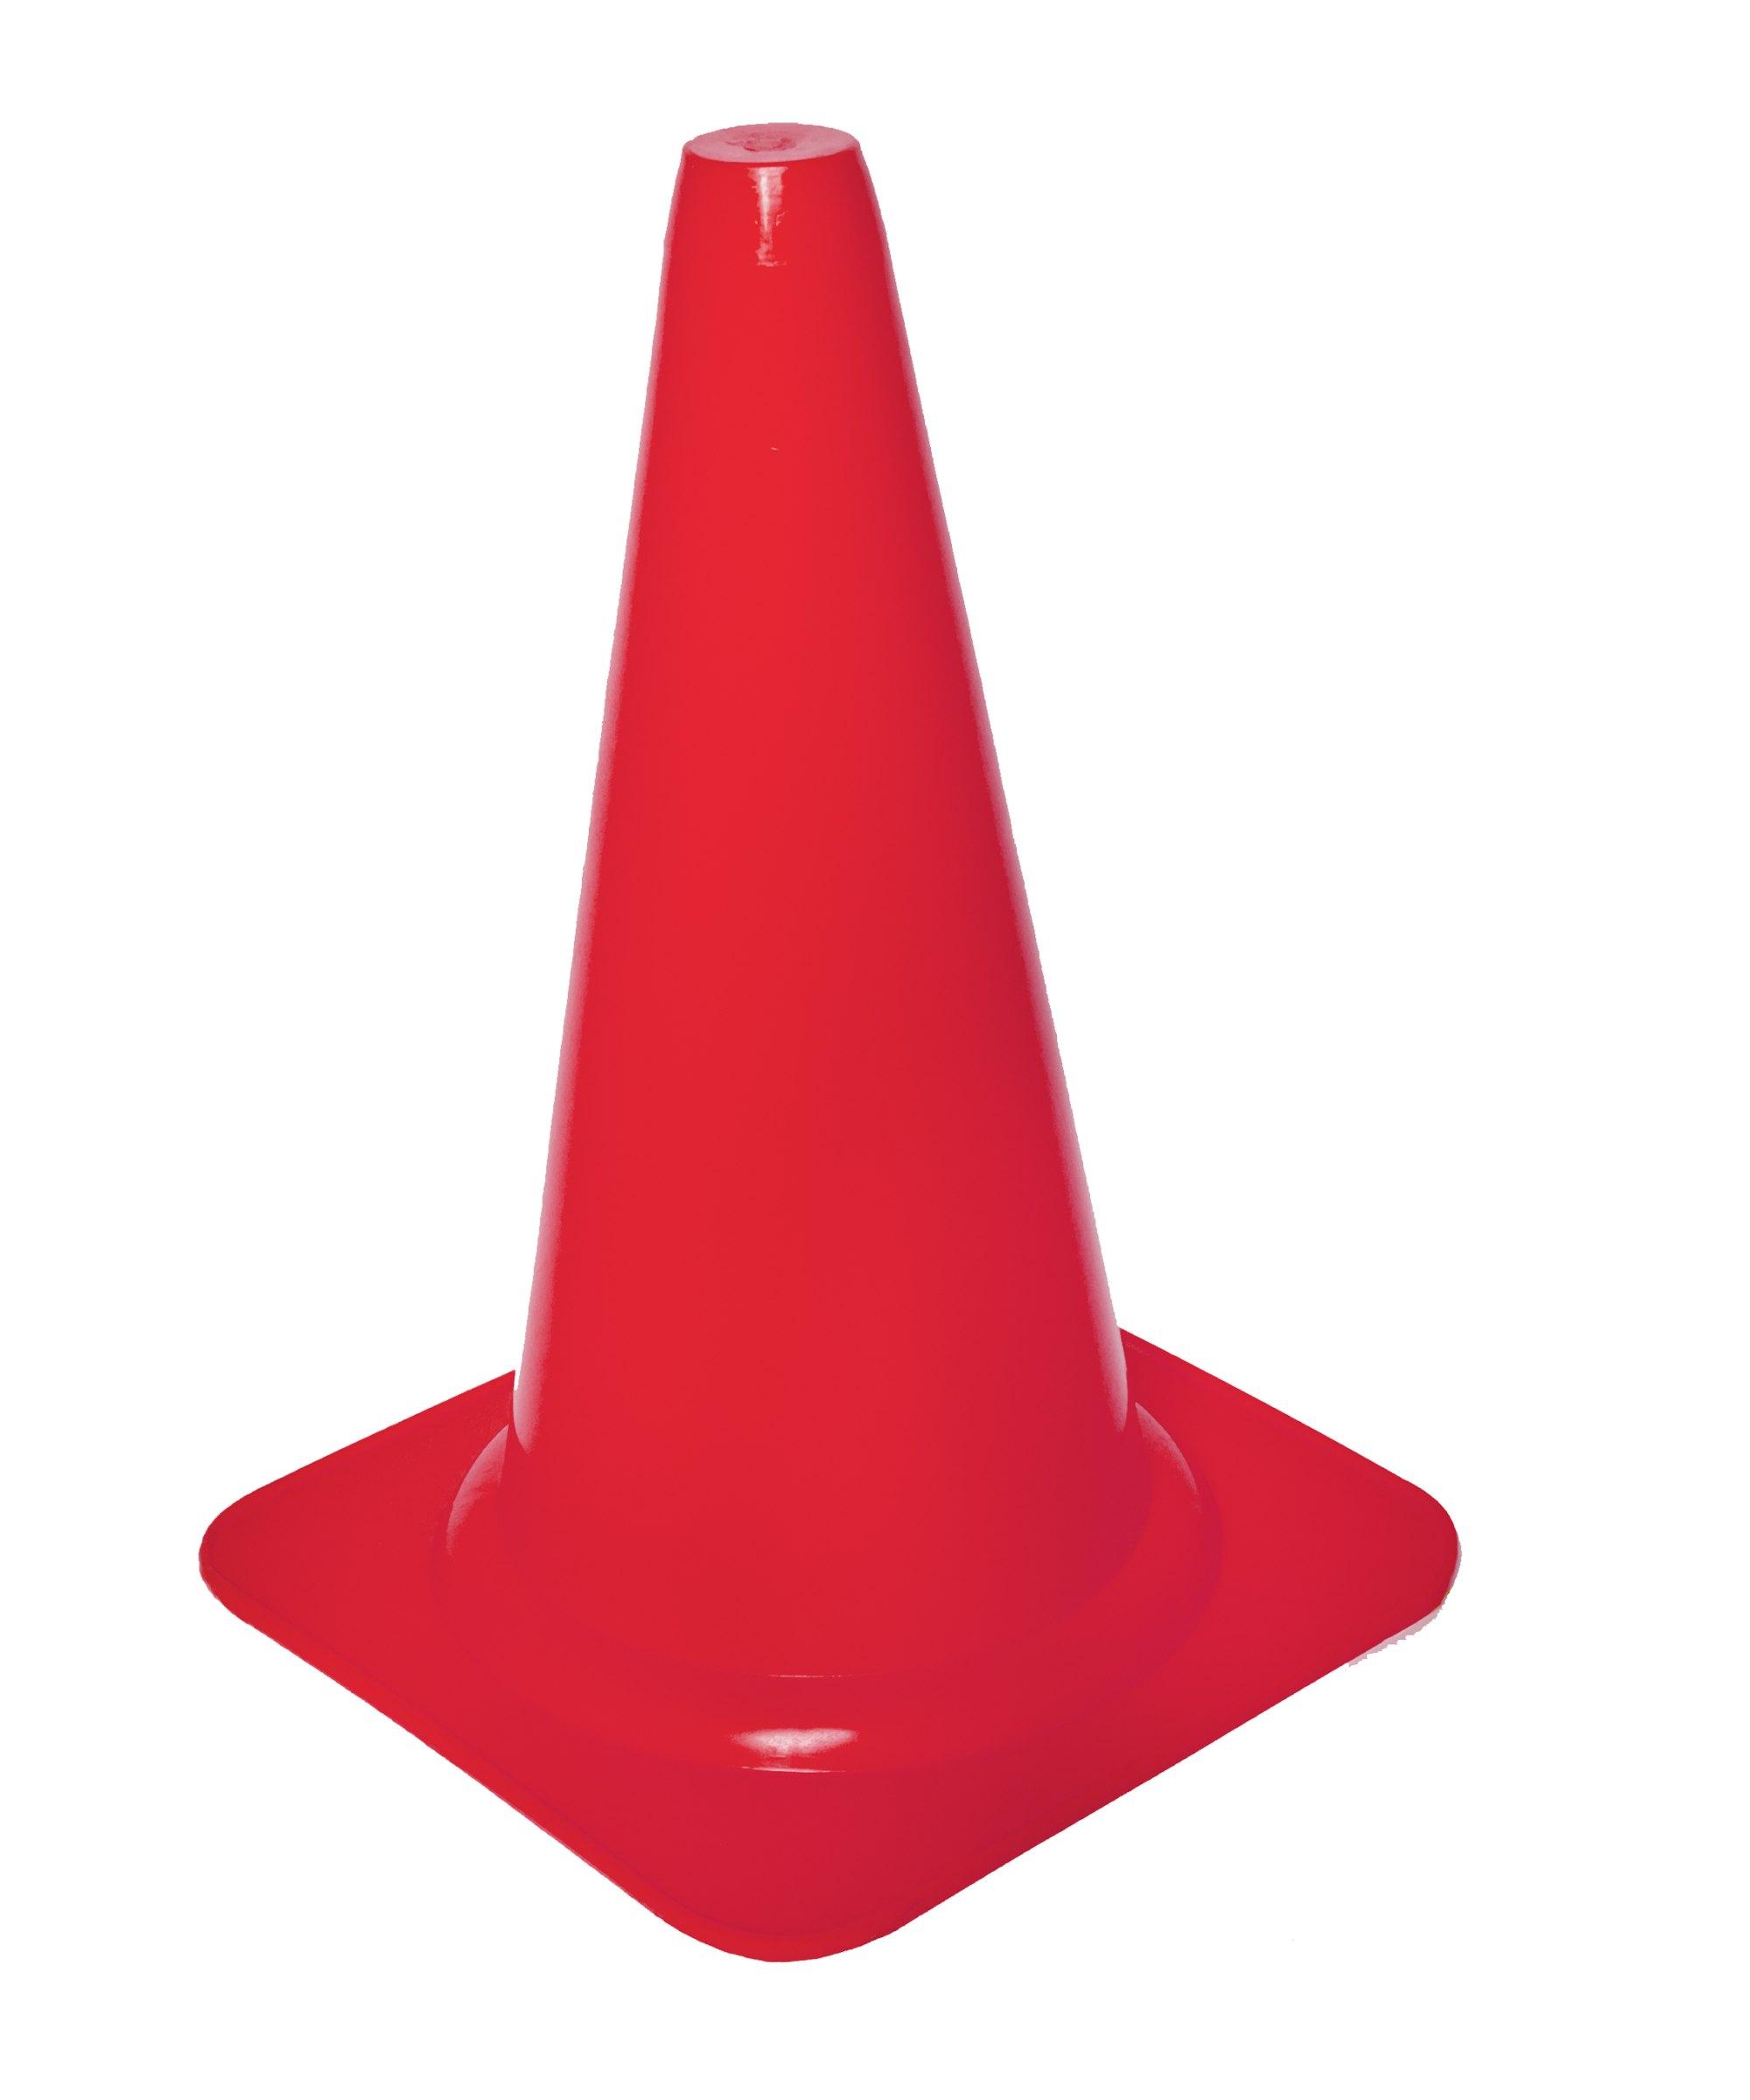 Cawila Markierungskegel S 23cm Rot - rot